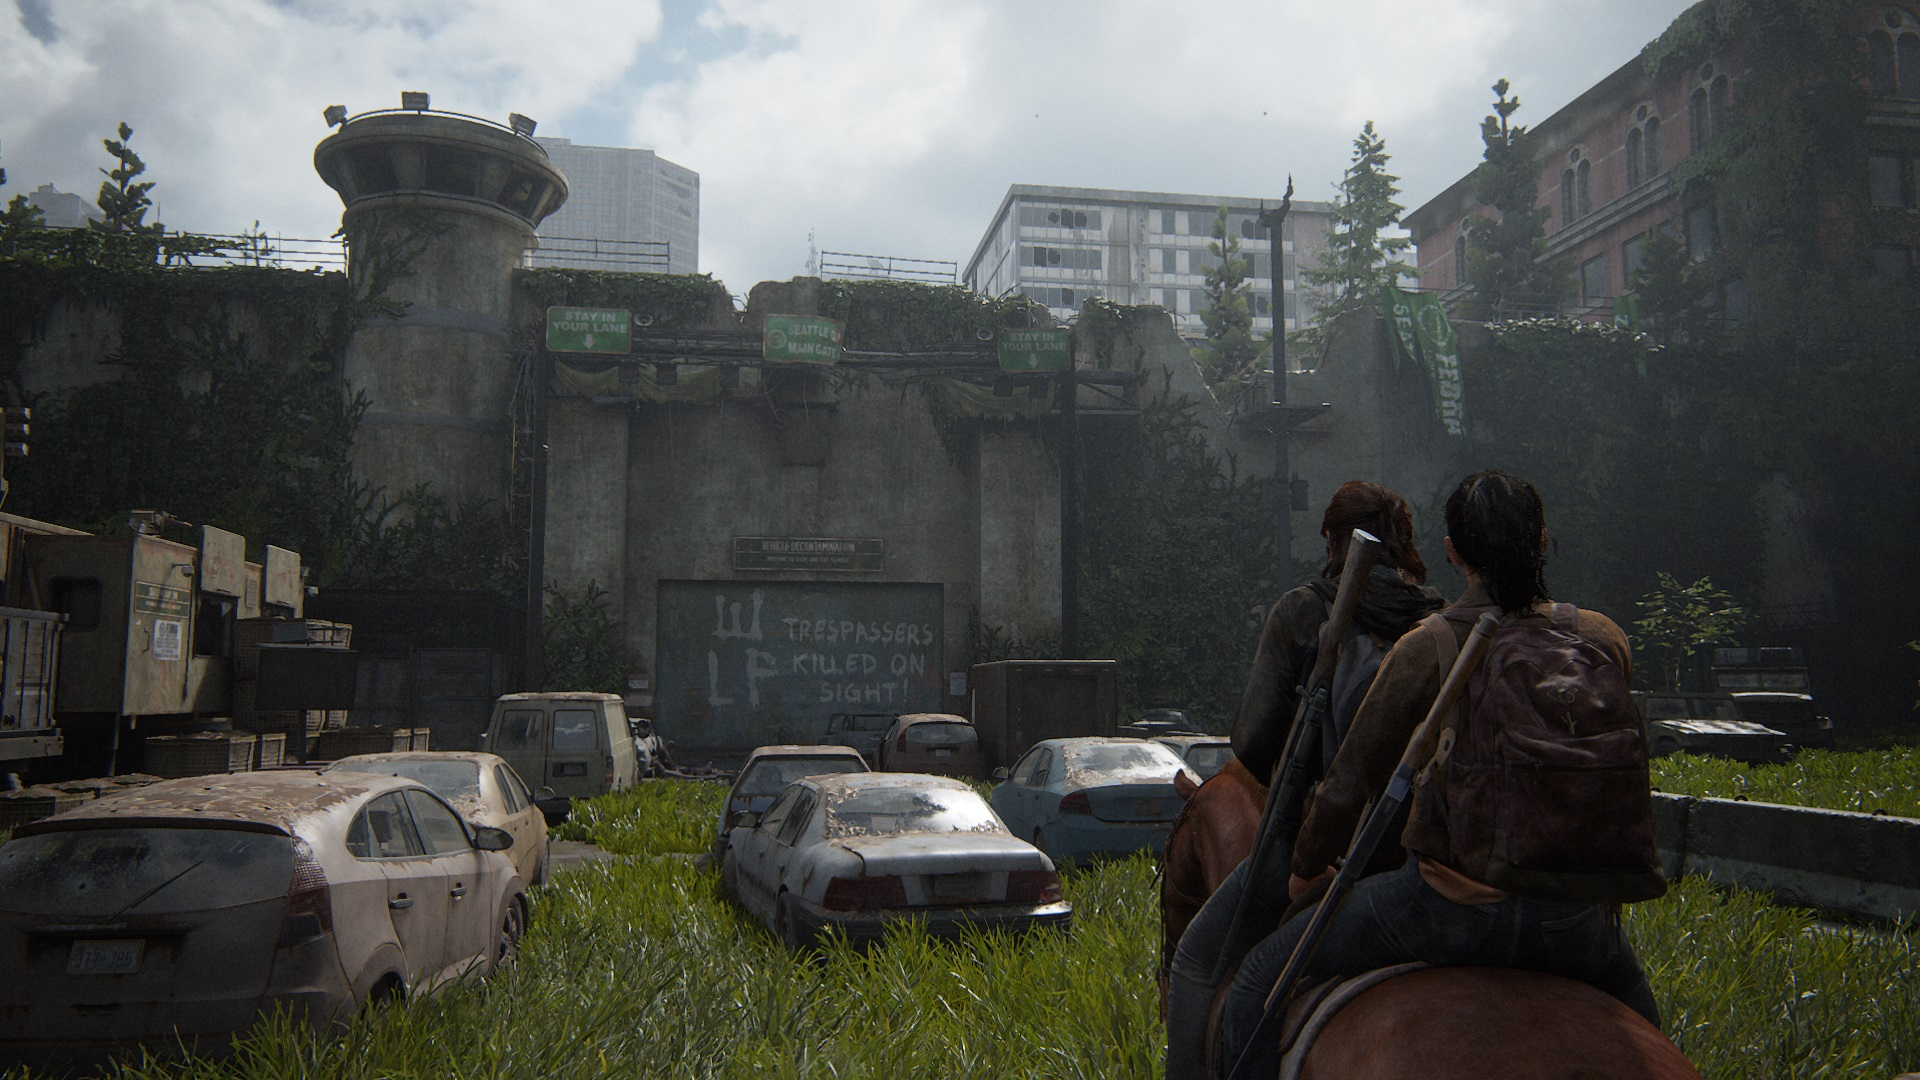 Seattle Quarantine Zone Wall